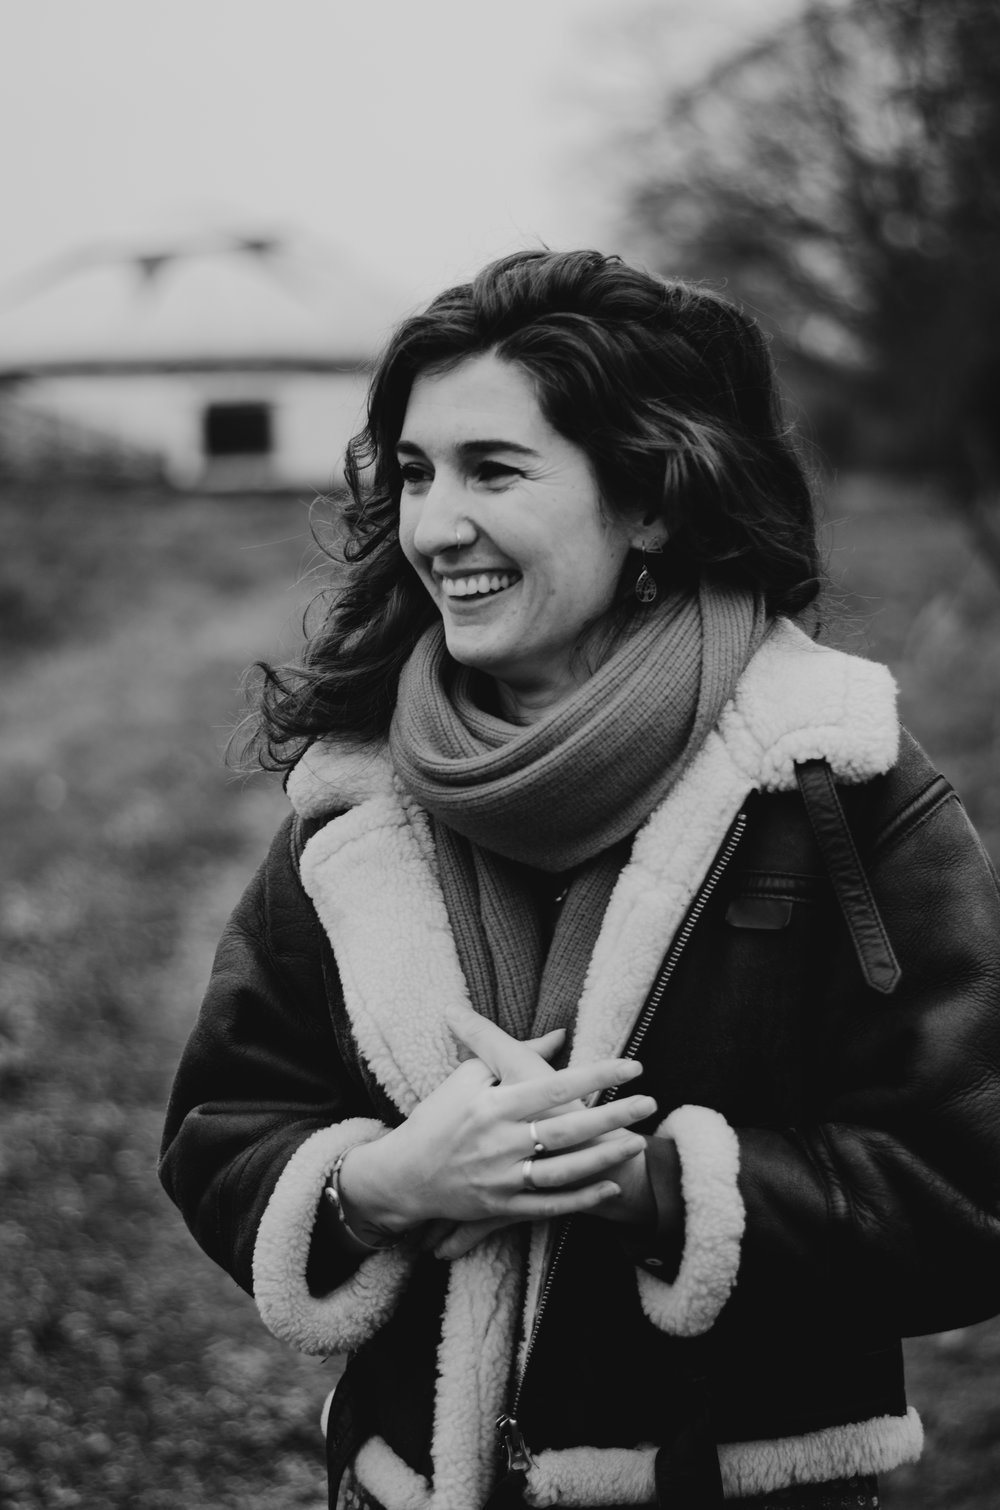 Chloe - Portraits - Aiste Saulyte Photography - 2018-01-05-57.jpg